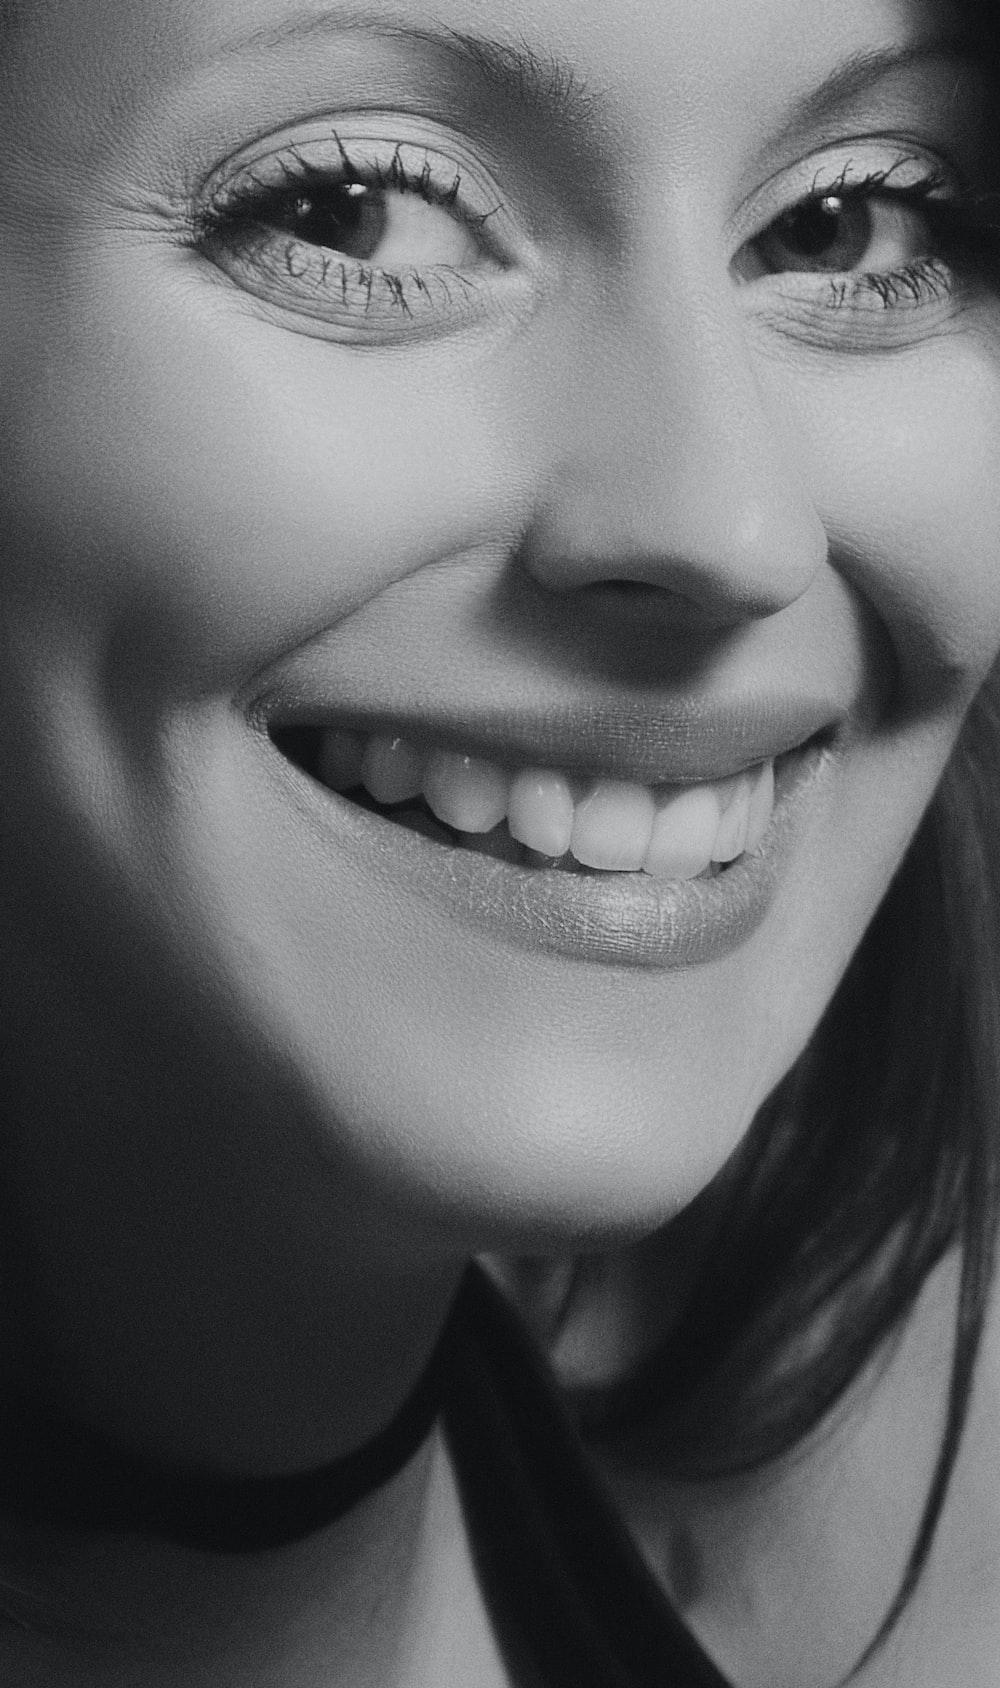 woman in halter top smiling